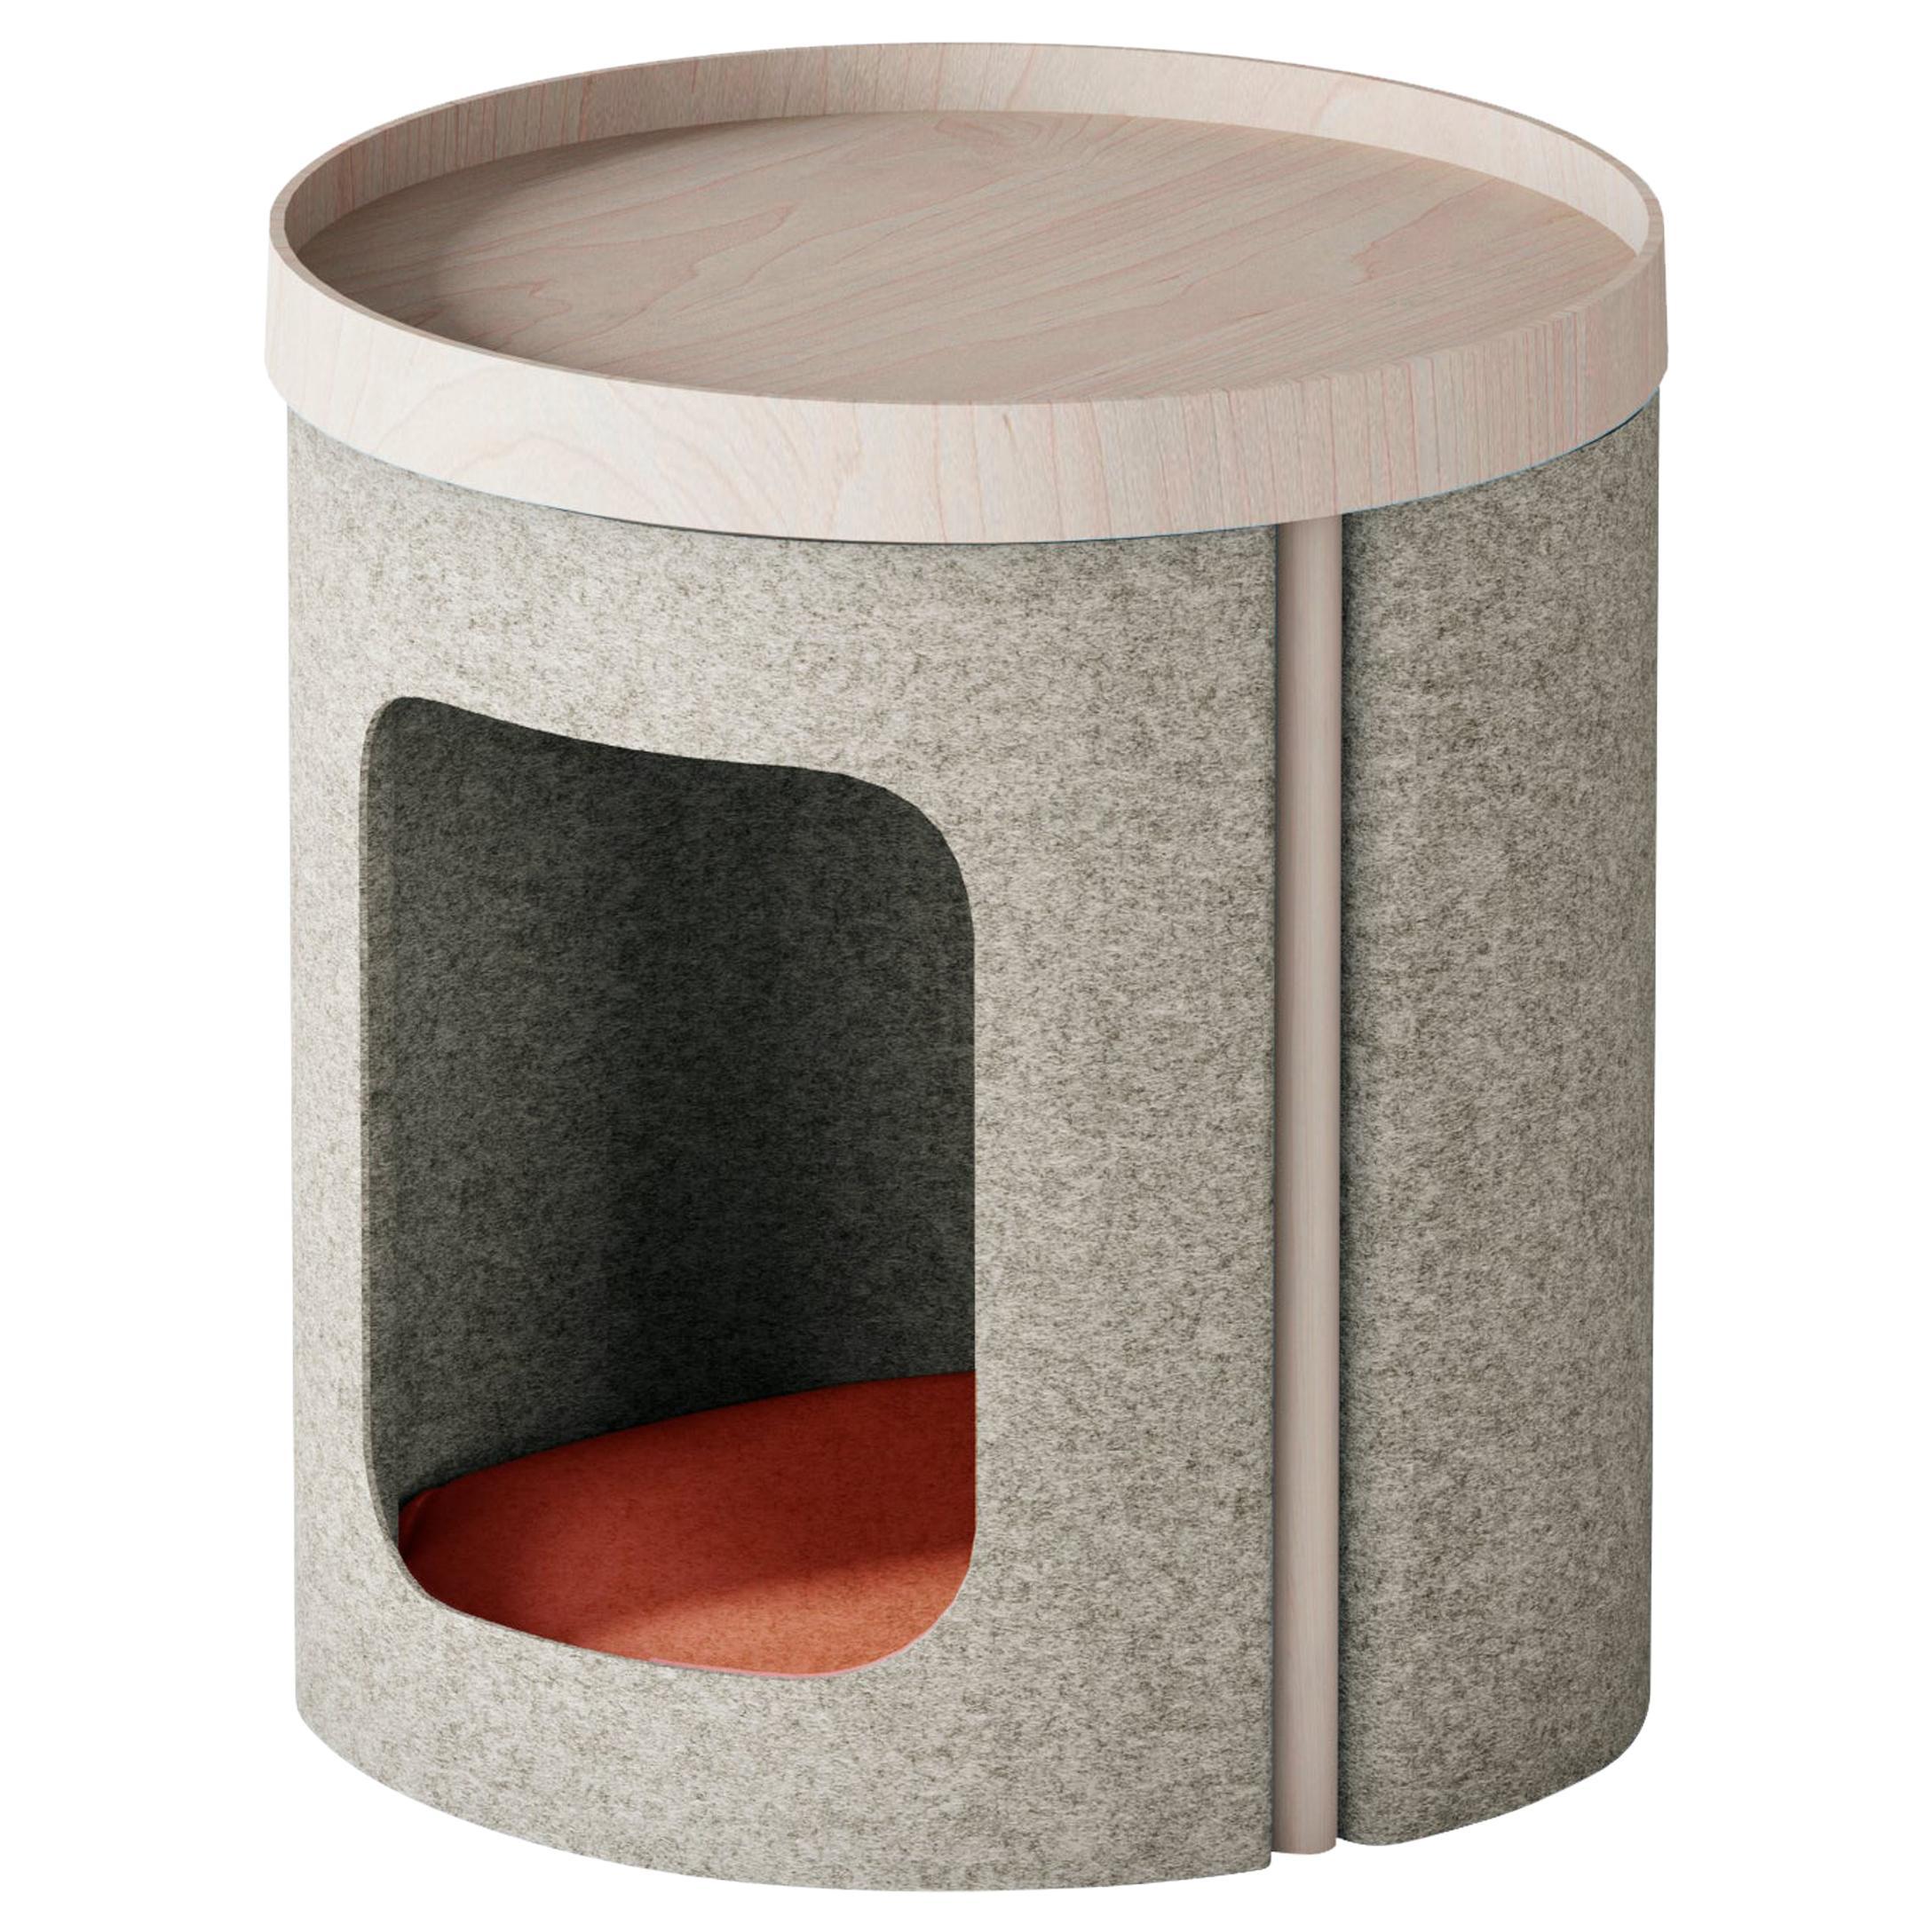 "Modern Coffee Table ""Lotto"" in Oak and Grey Felt"